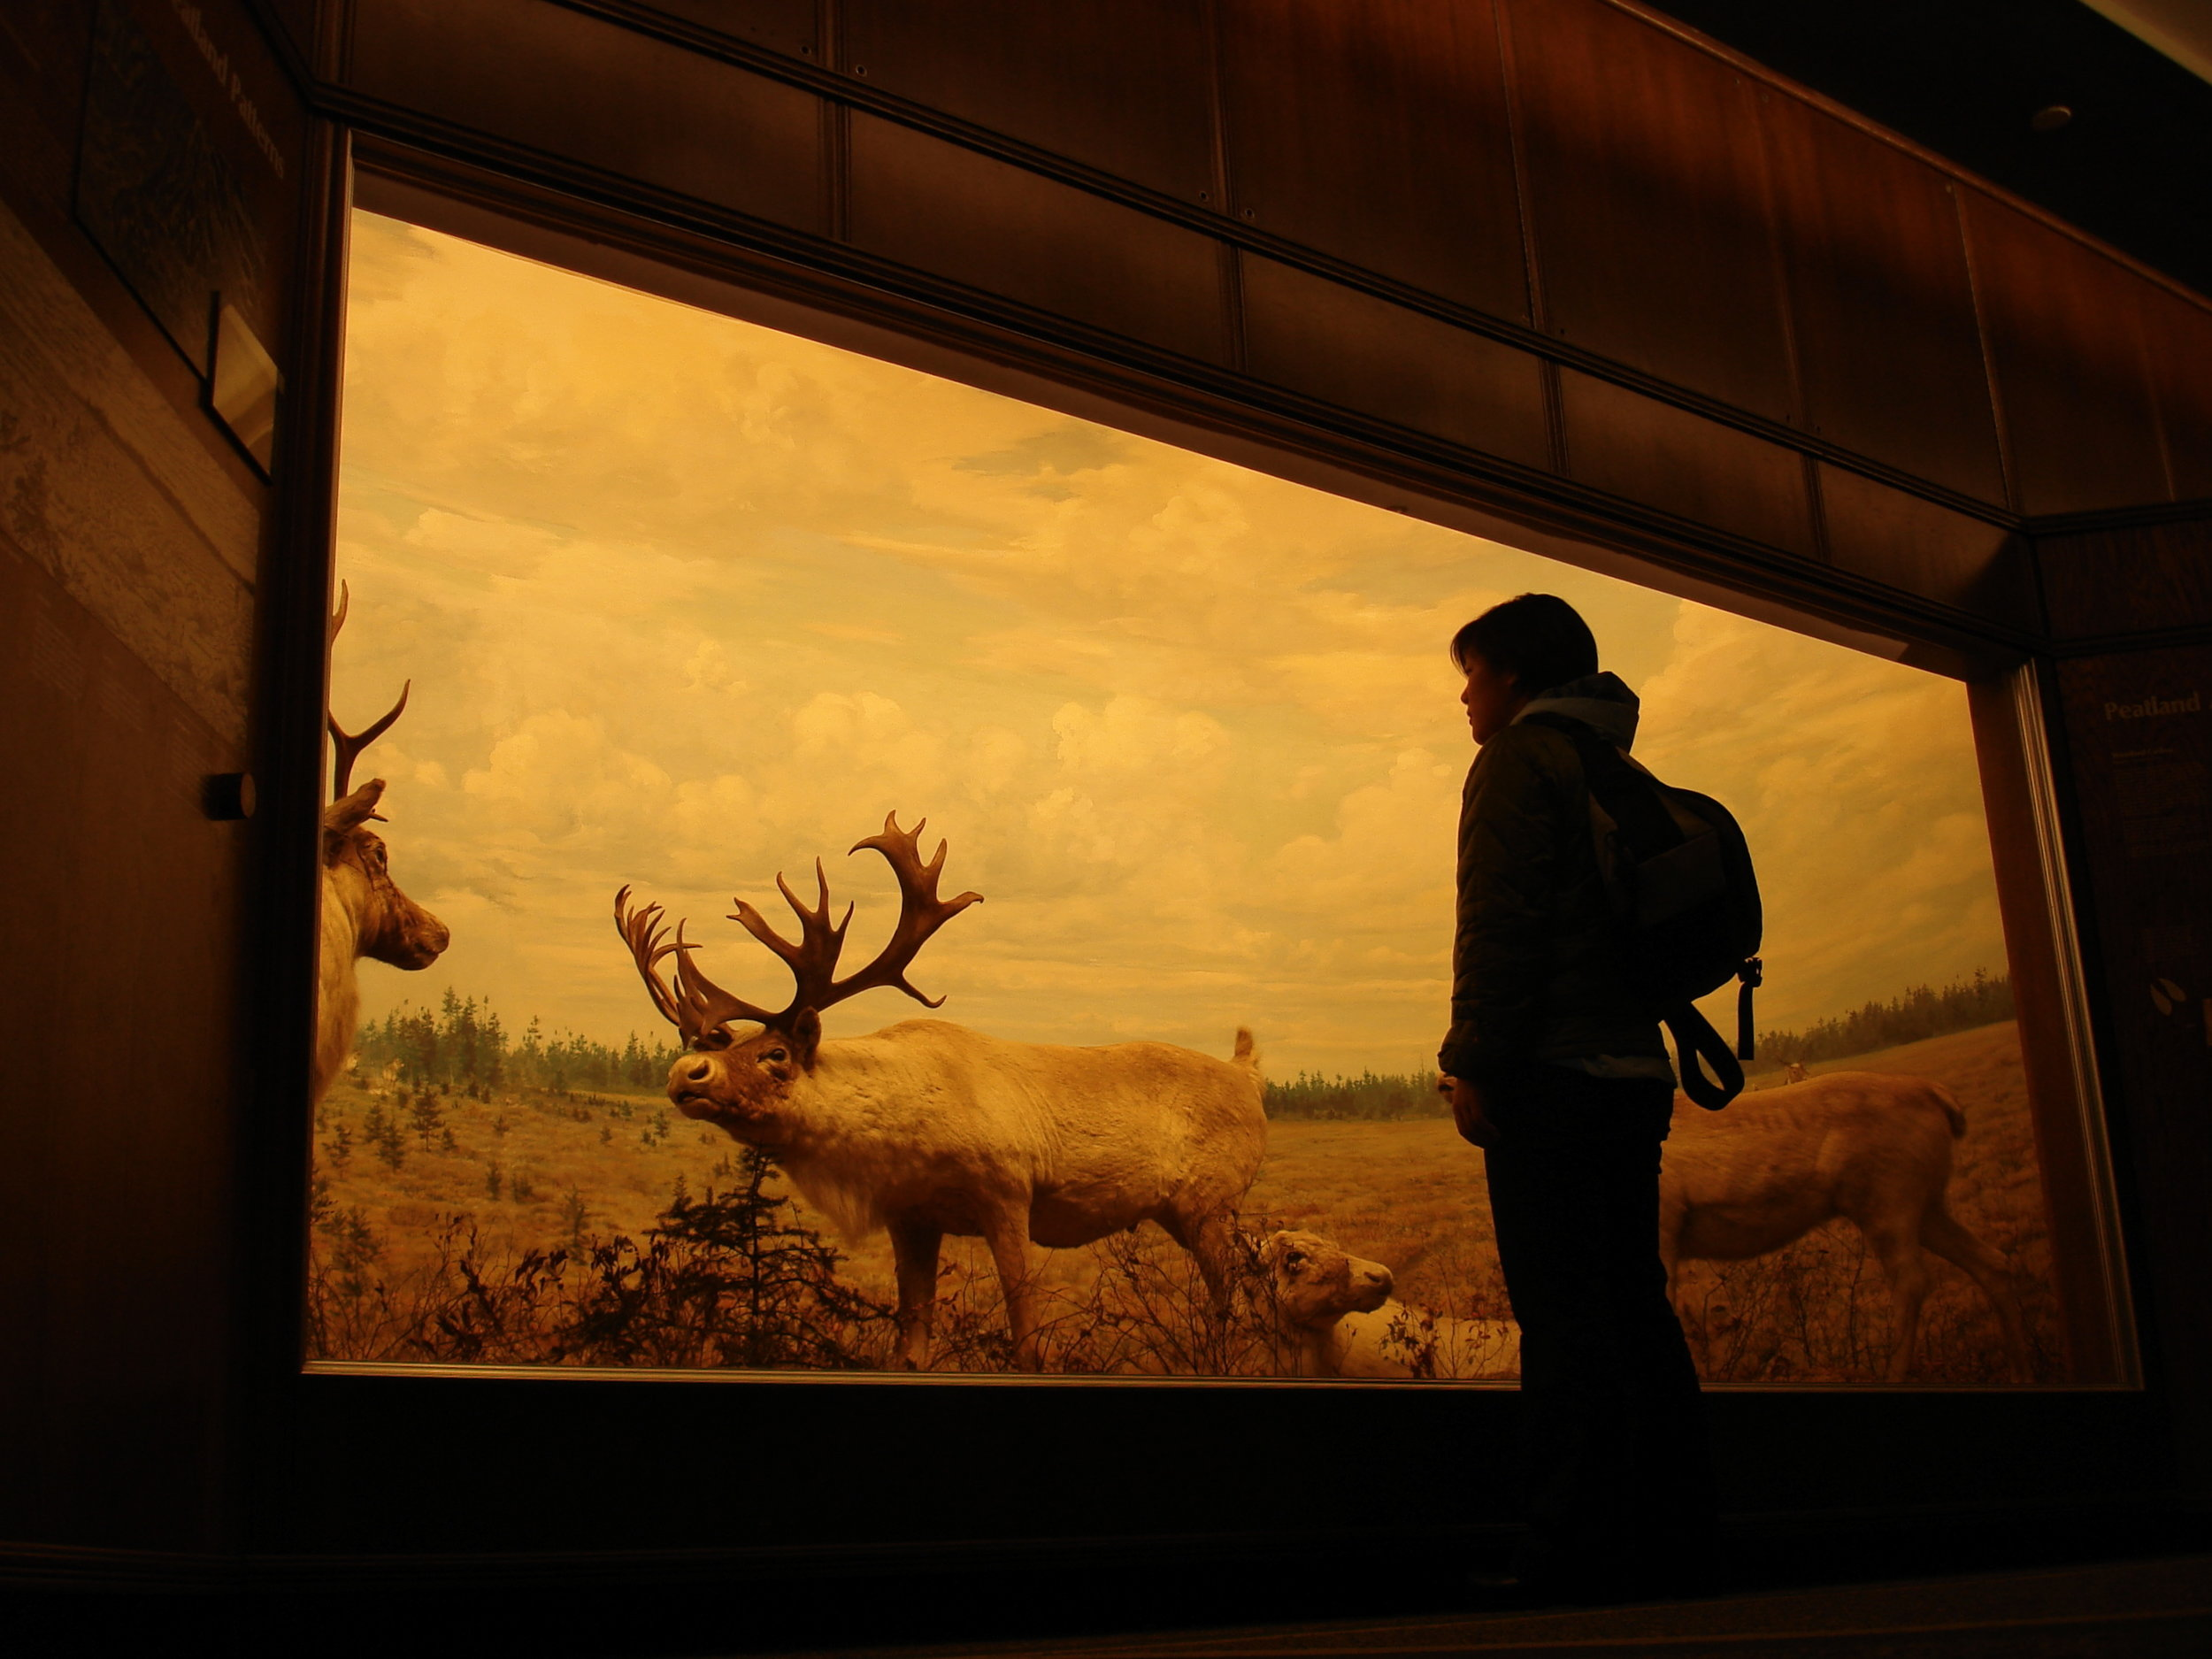 Bell_Museum_of_Natural_History_diorama.jpg